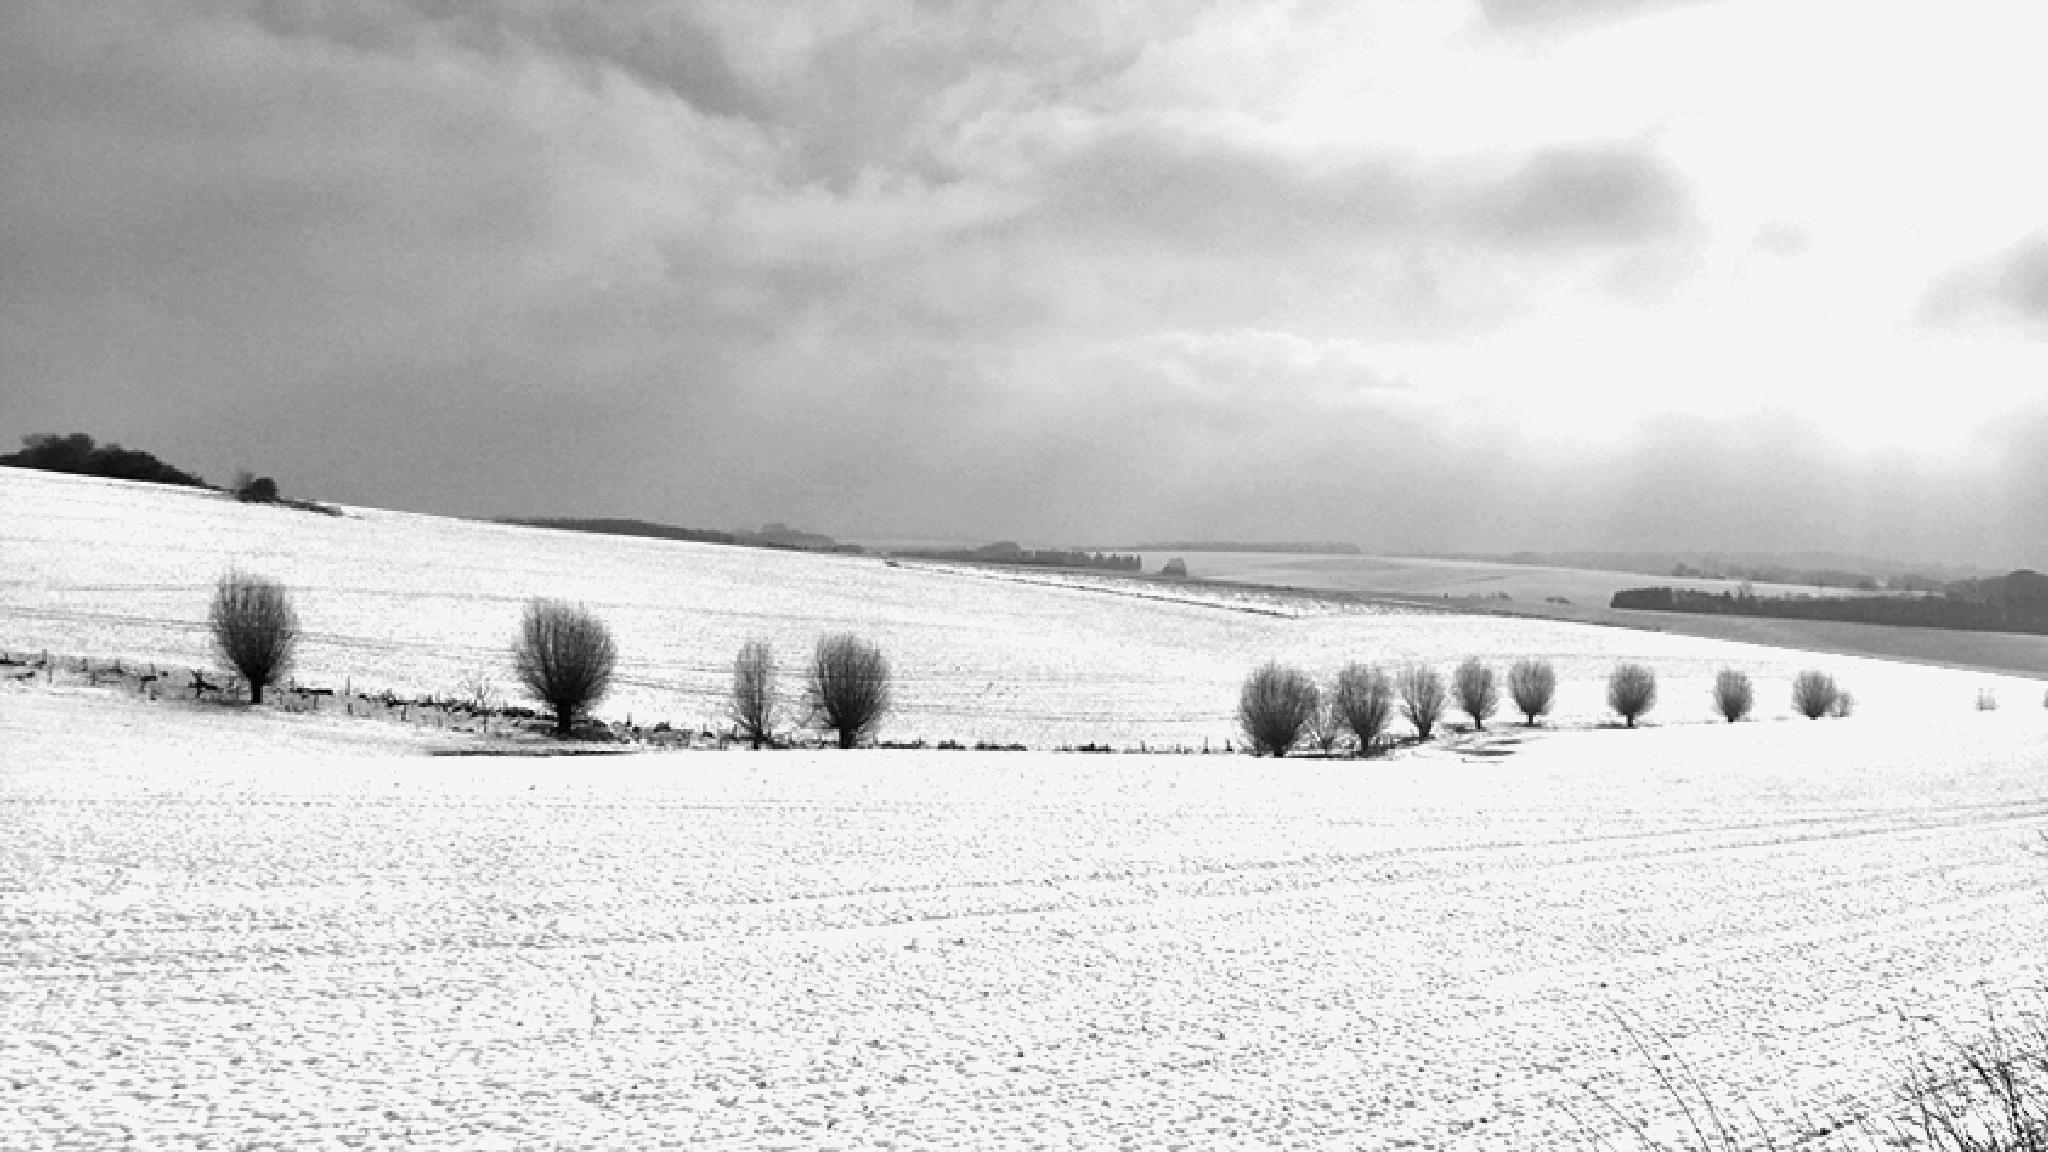 Winter landscape #4 by Gernot Schwarz